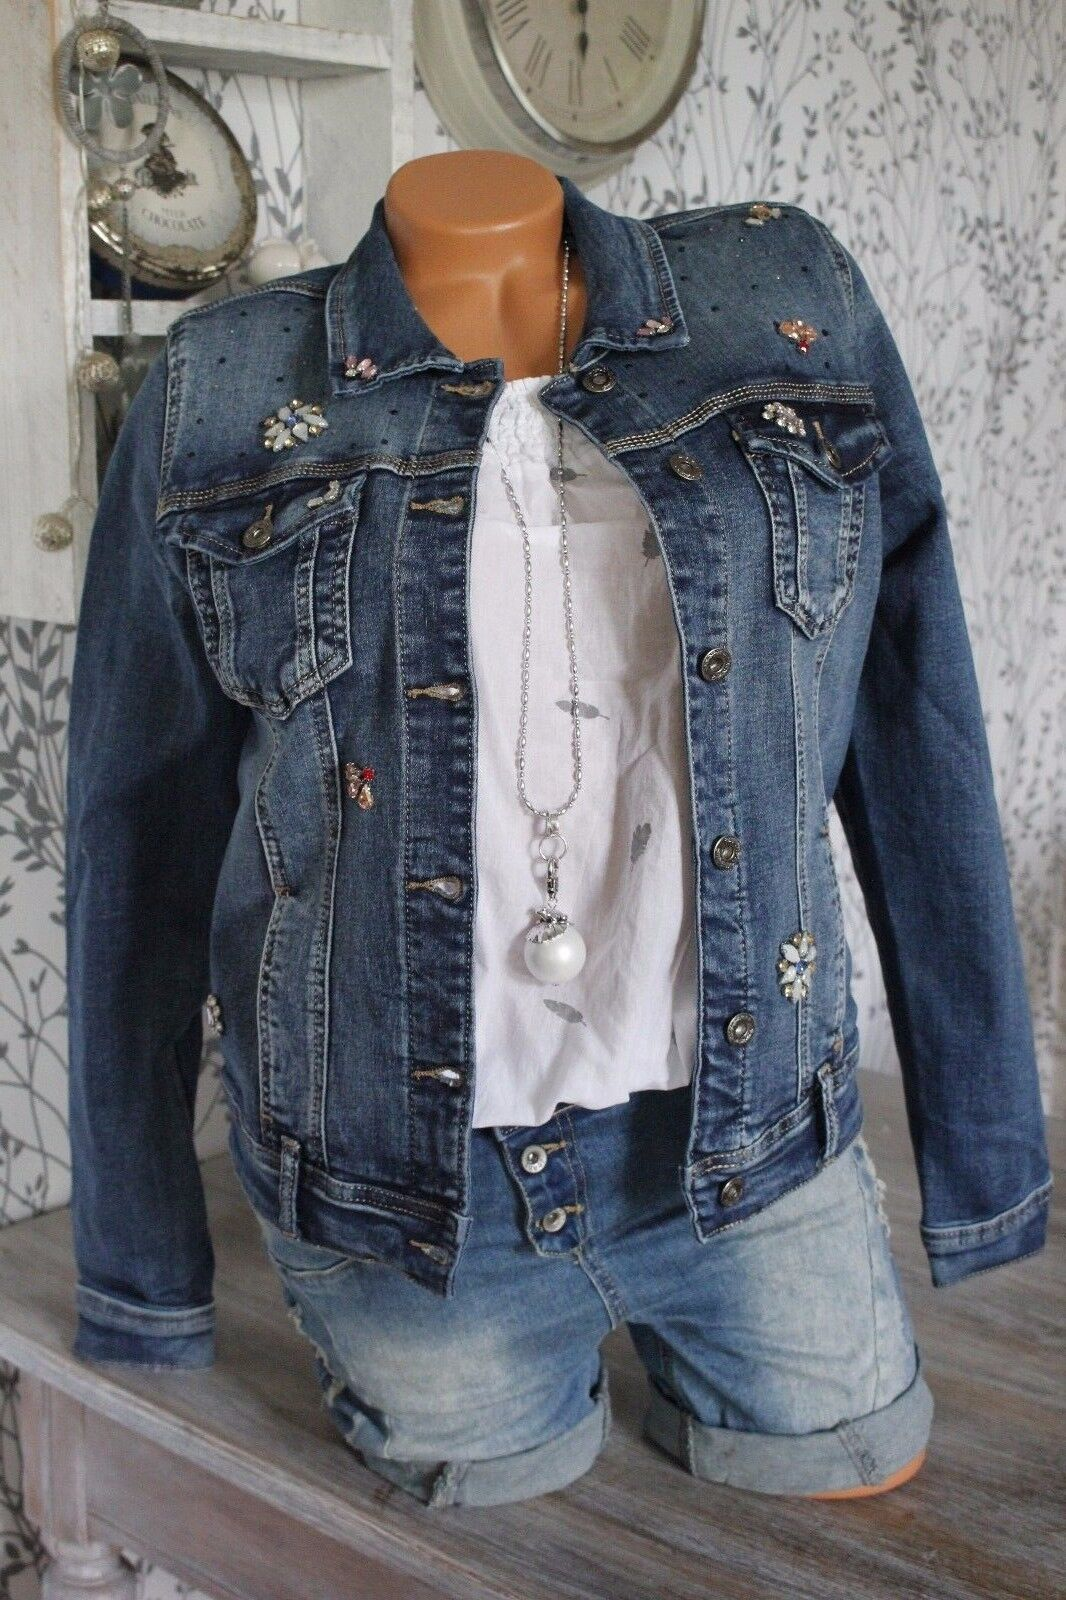 ♥ Jeansjacke Jeans Jacke Strass Flower ARTIKELBESCHR. BEACHTEN BLAU 04 04 04 81251b